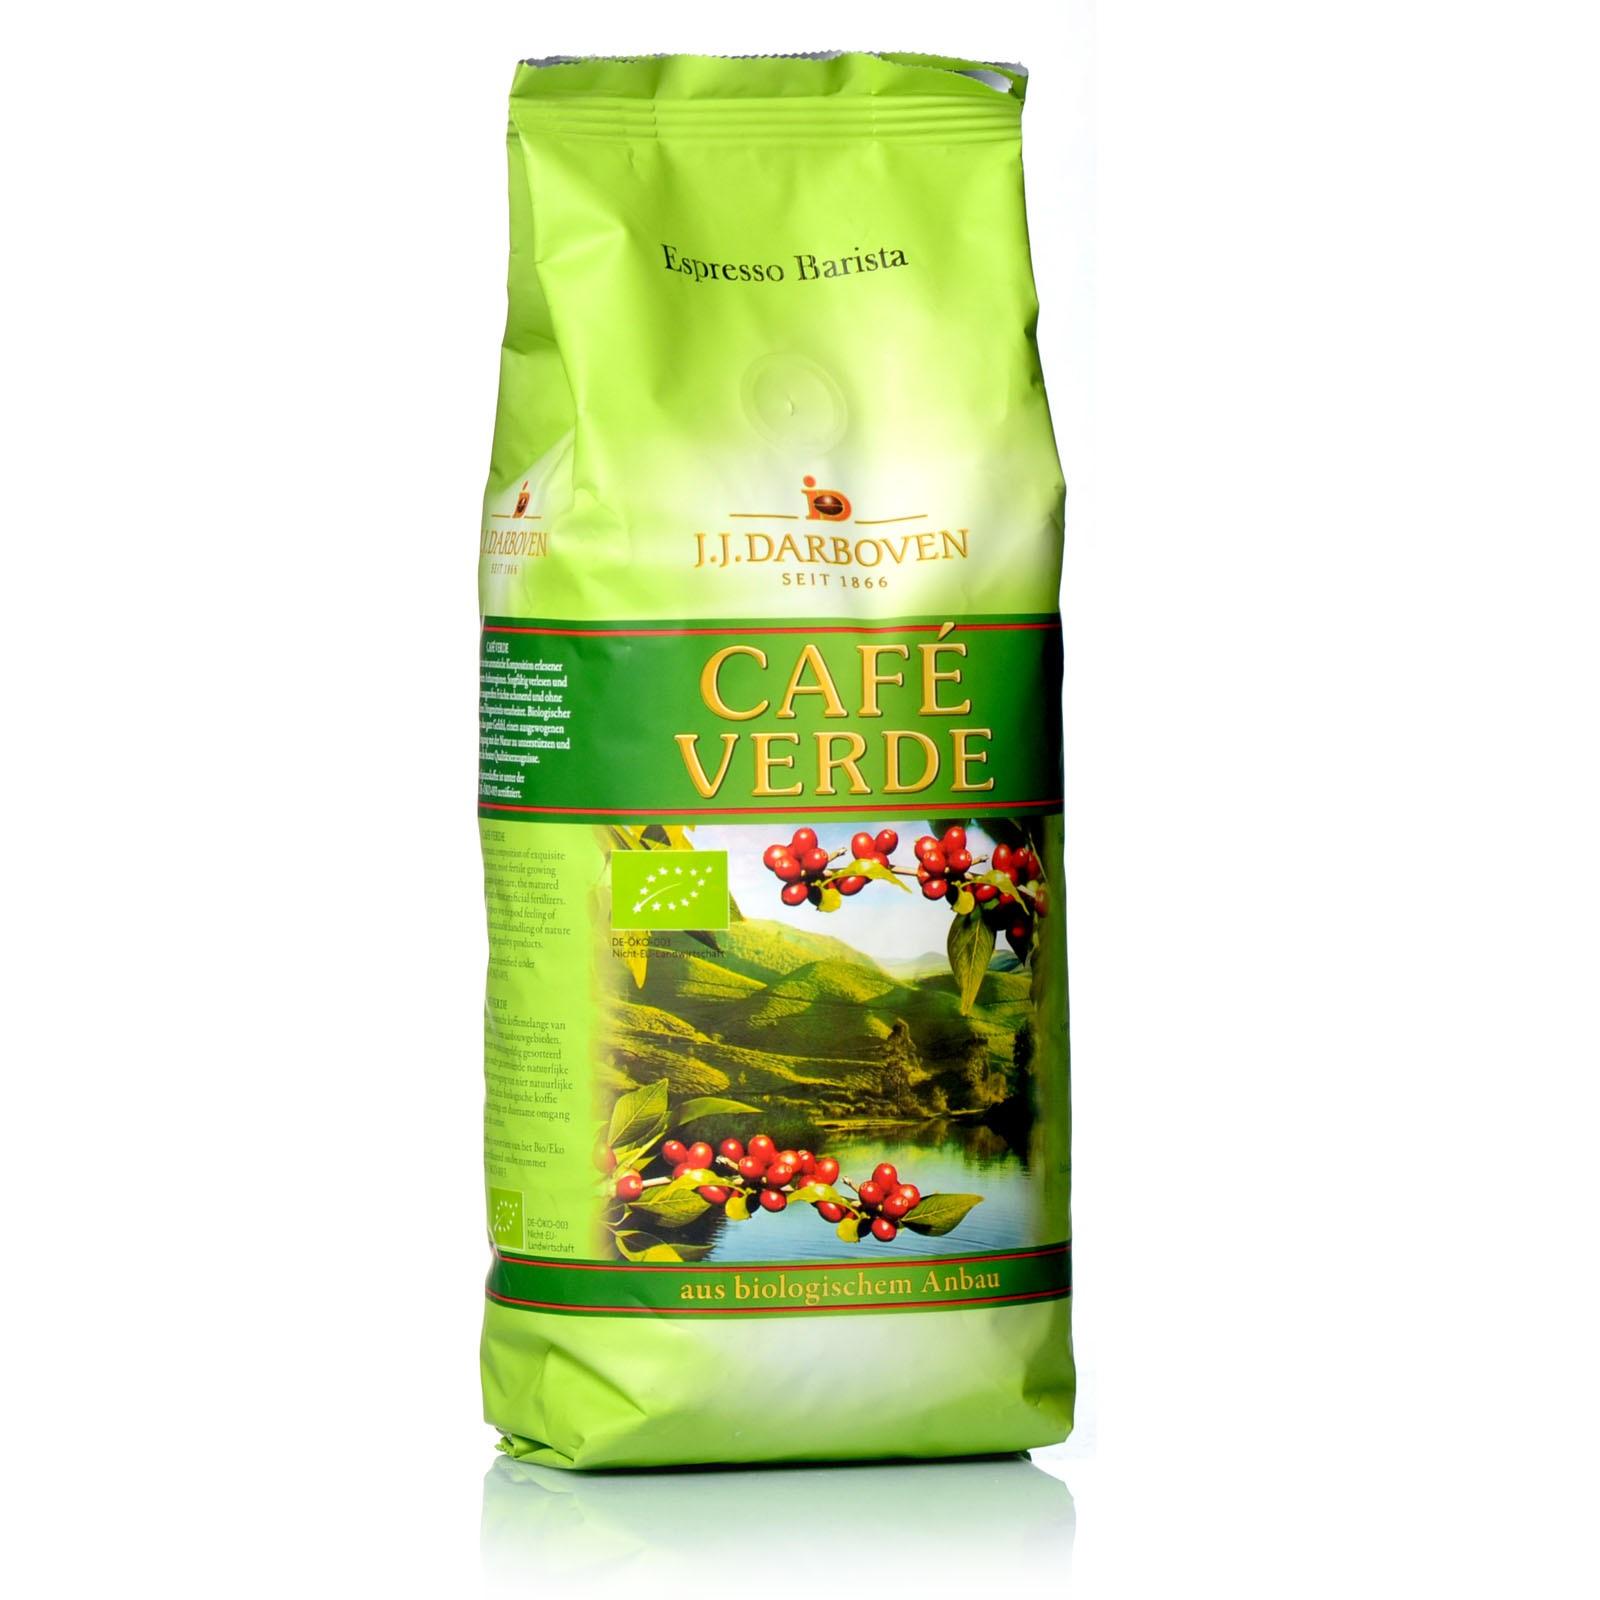 Darboven Café Verde Espresso Bio Barista 1Kg ganze Bohnen